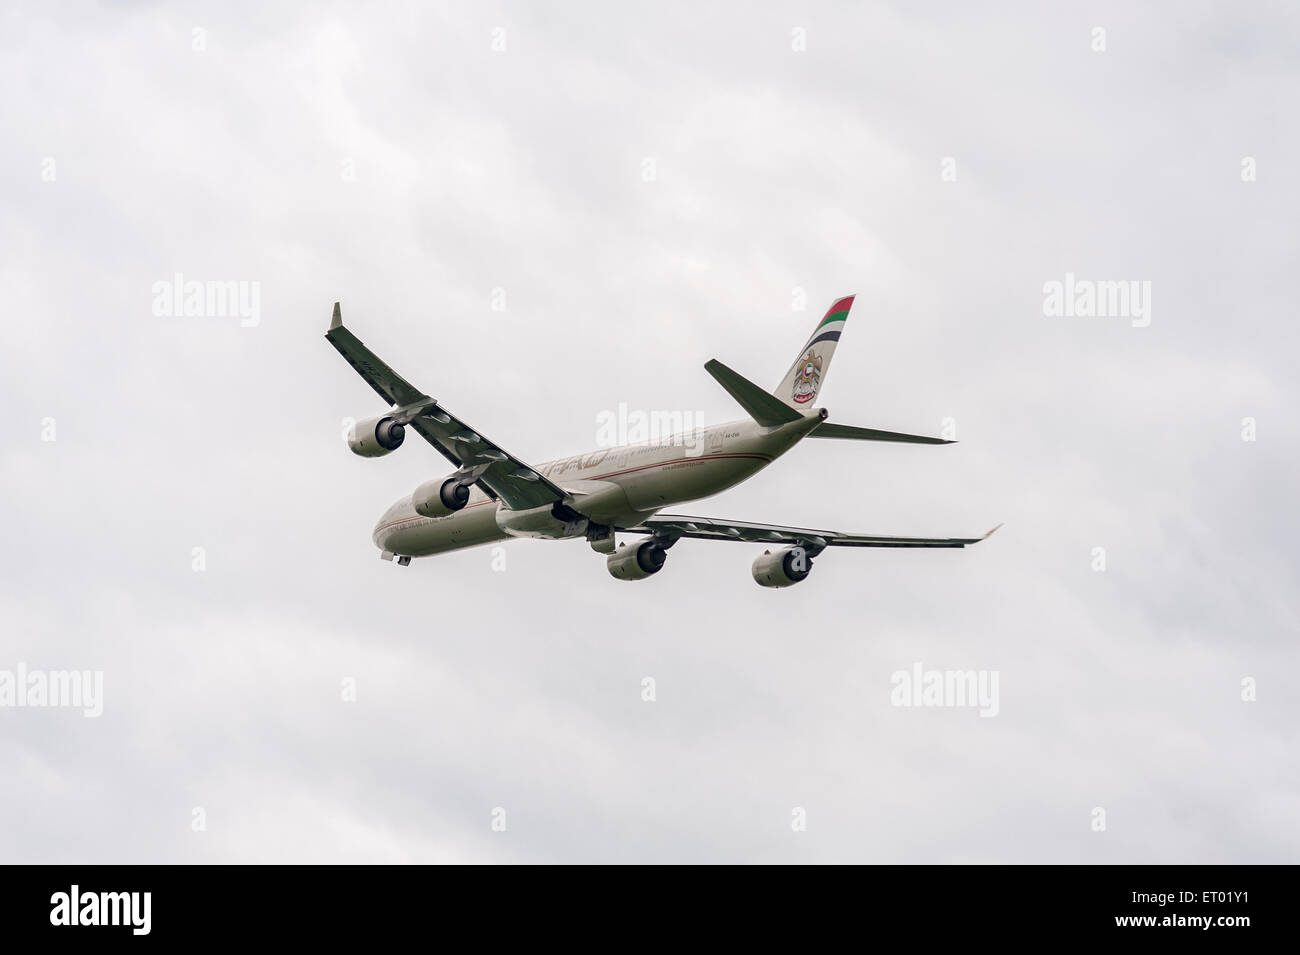 Etihad Airways - Airplane - Stock Image